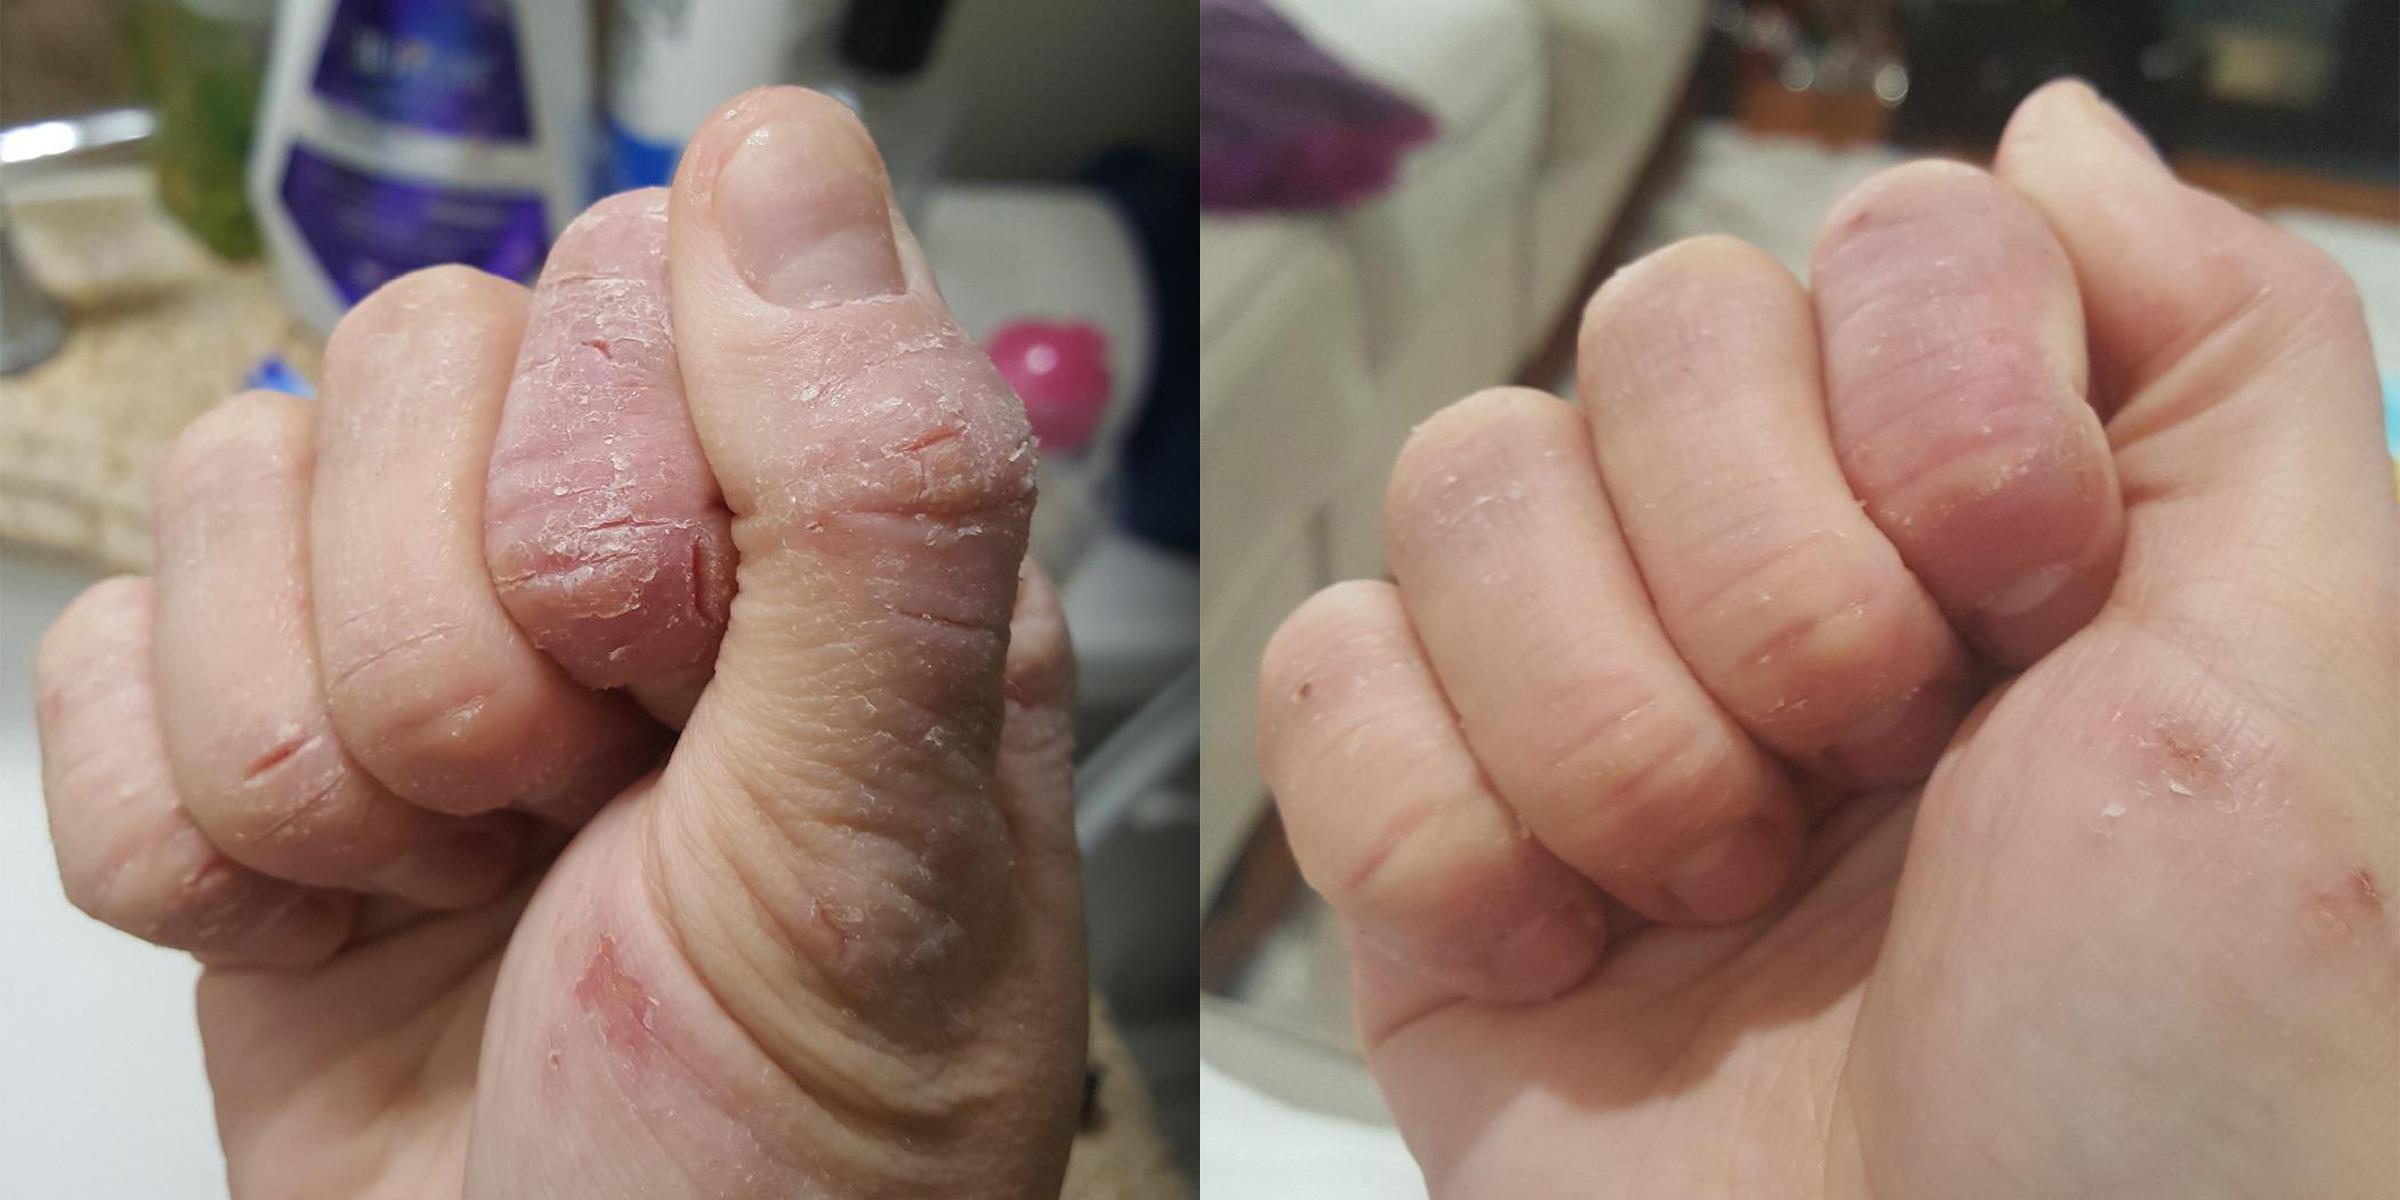 cracked skin on hands